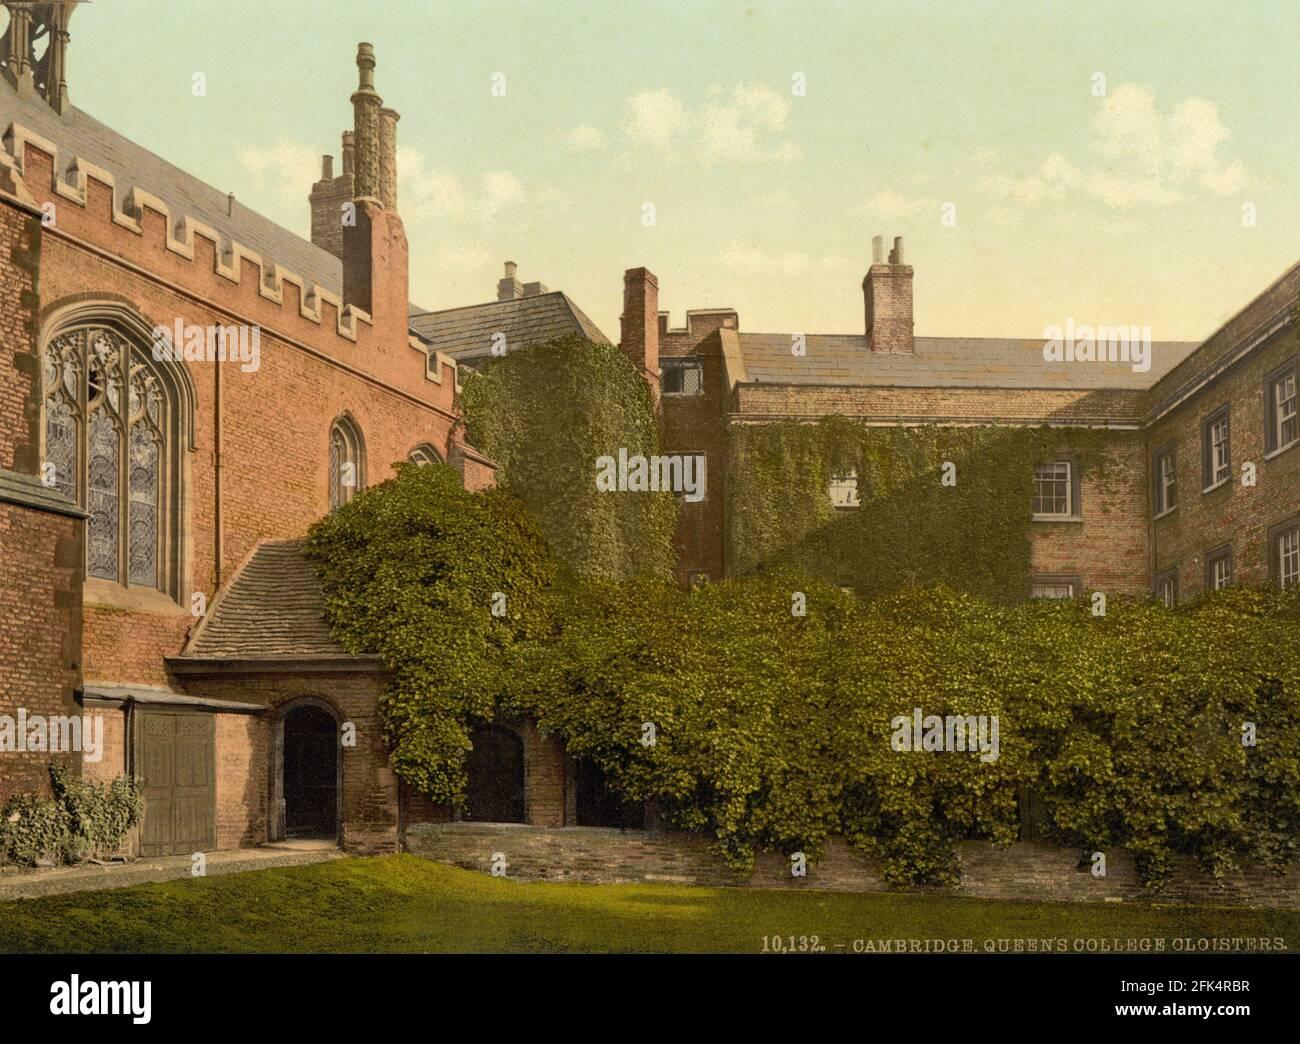 Queen's College Cloisters, Cambridge University, Cambridge um 1890-1900 Stockfoto